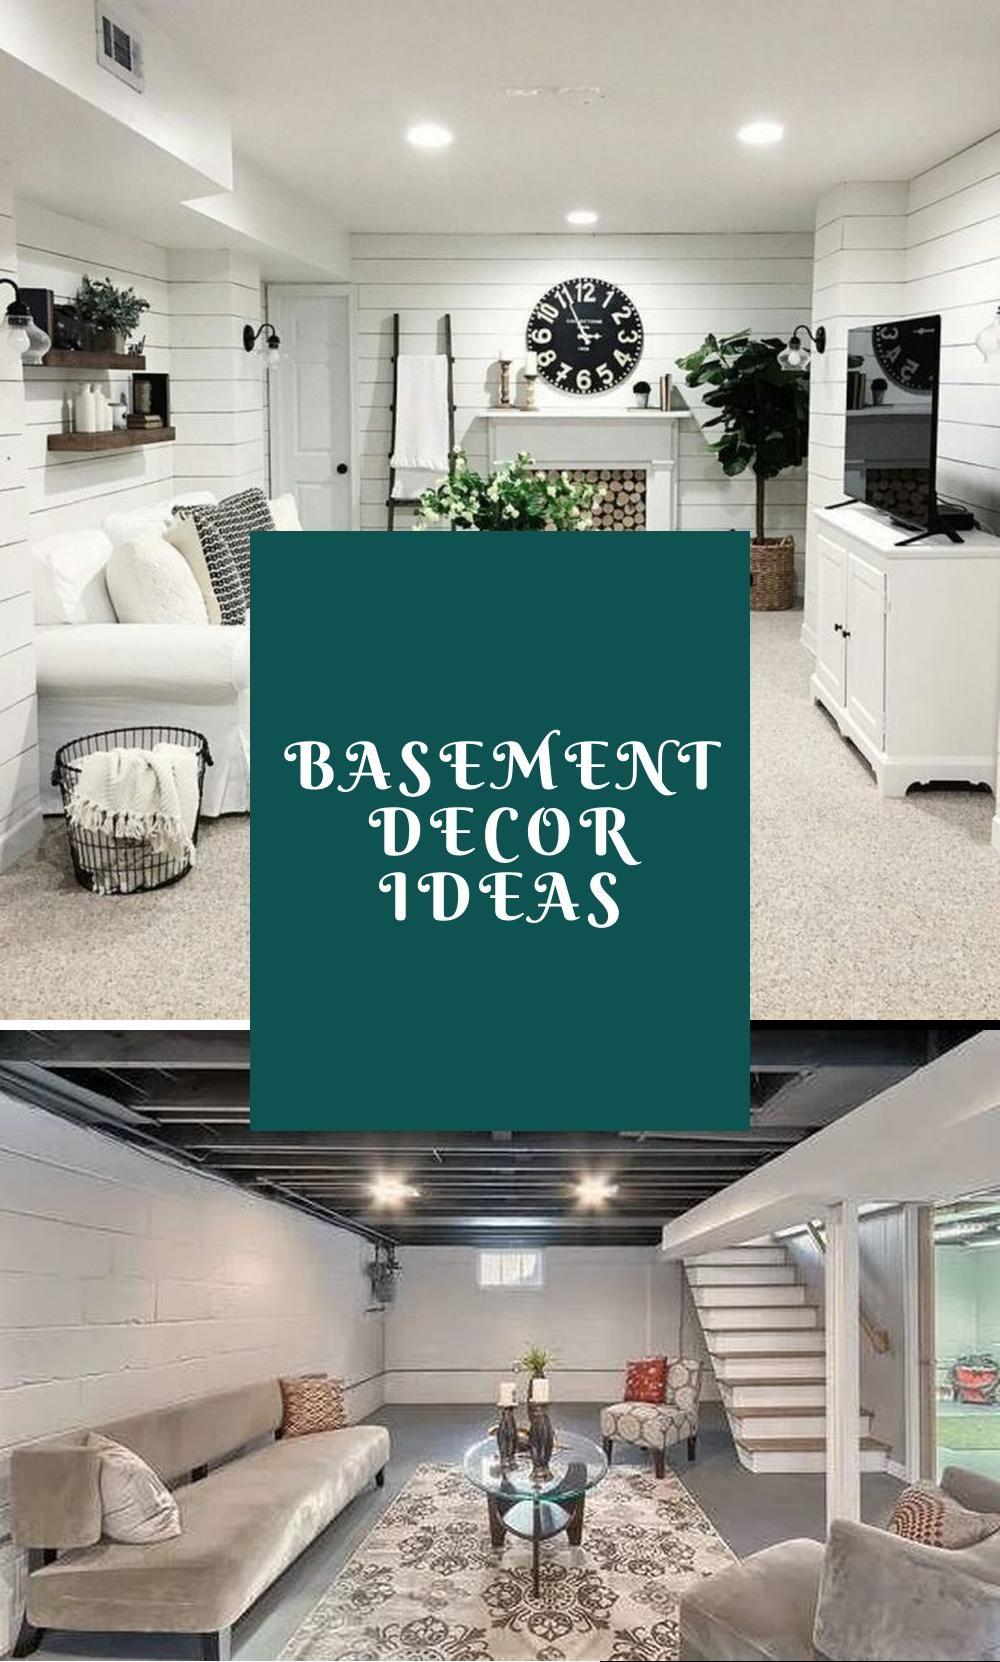 Pin on Basement Decorating